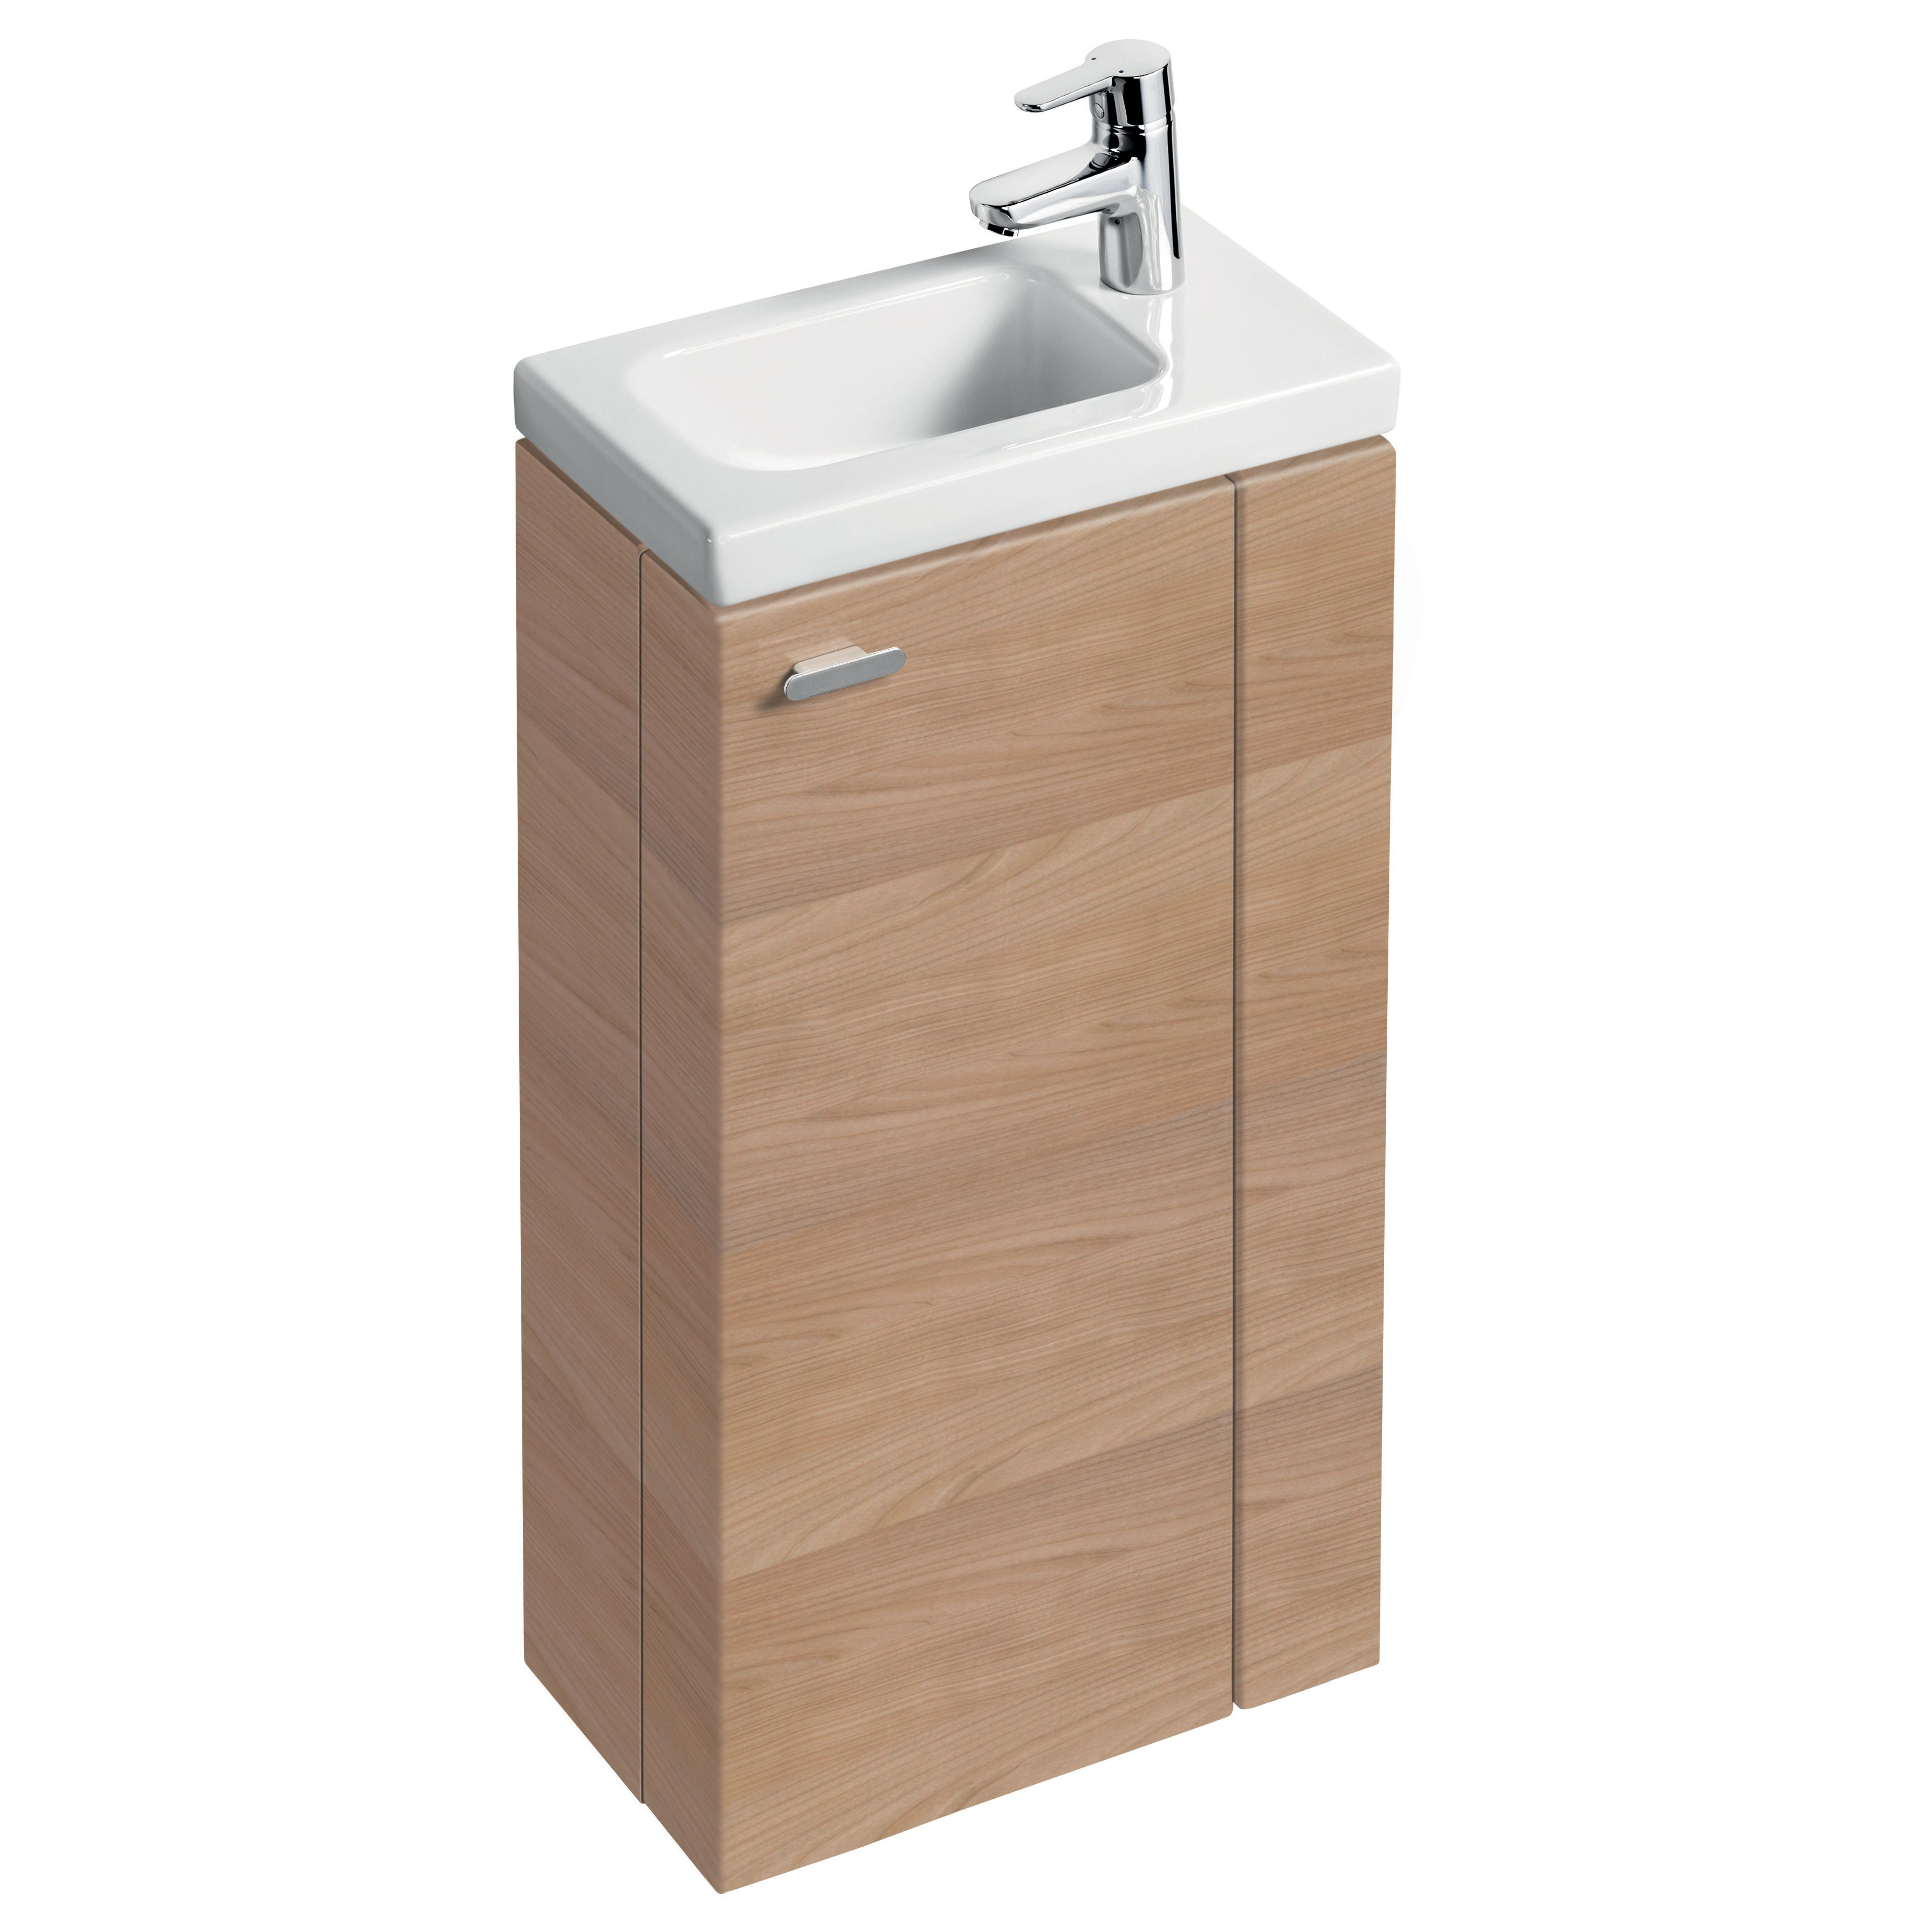 Bathroom Sinks B&Q Ireland oak freestanding furniture | diy